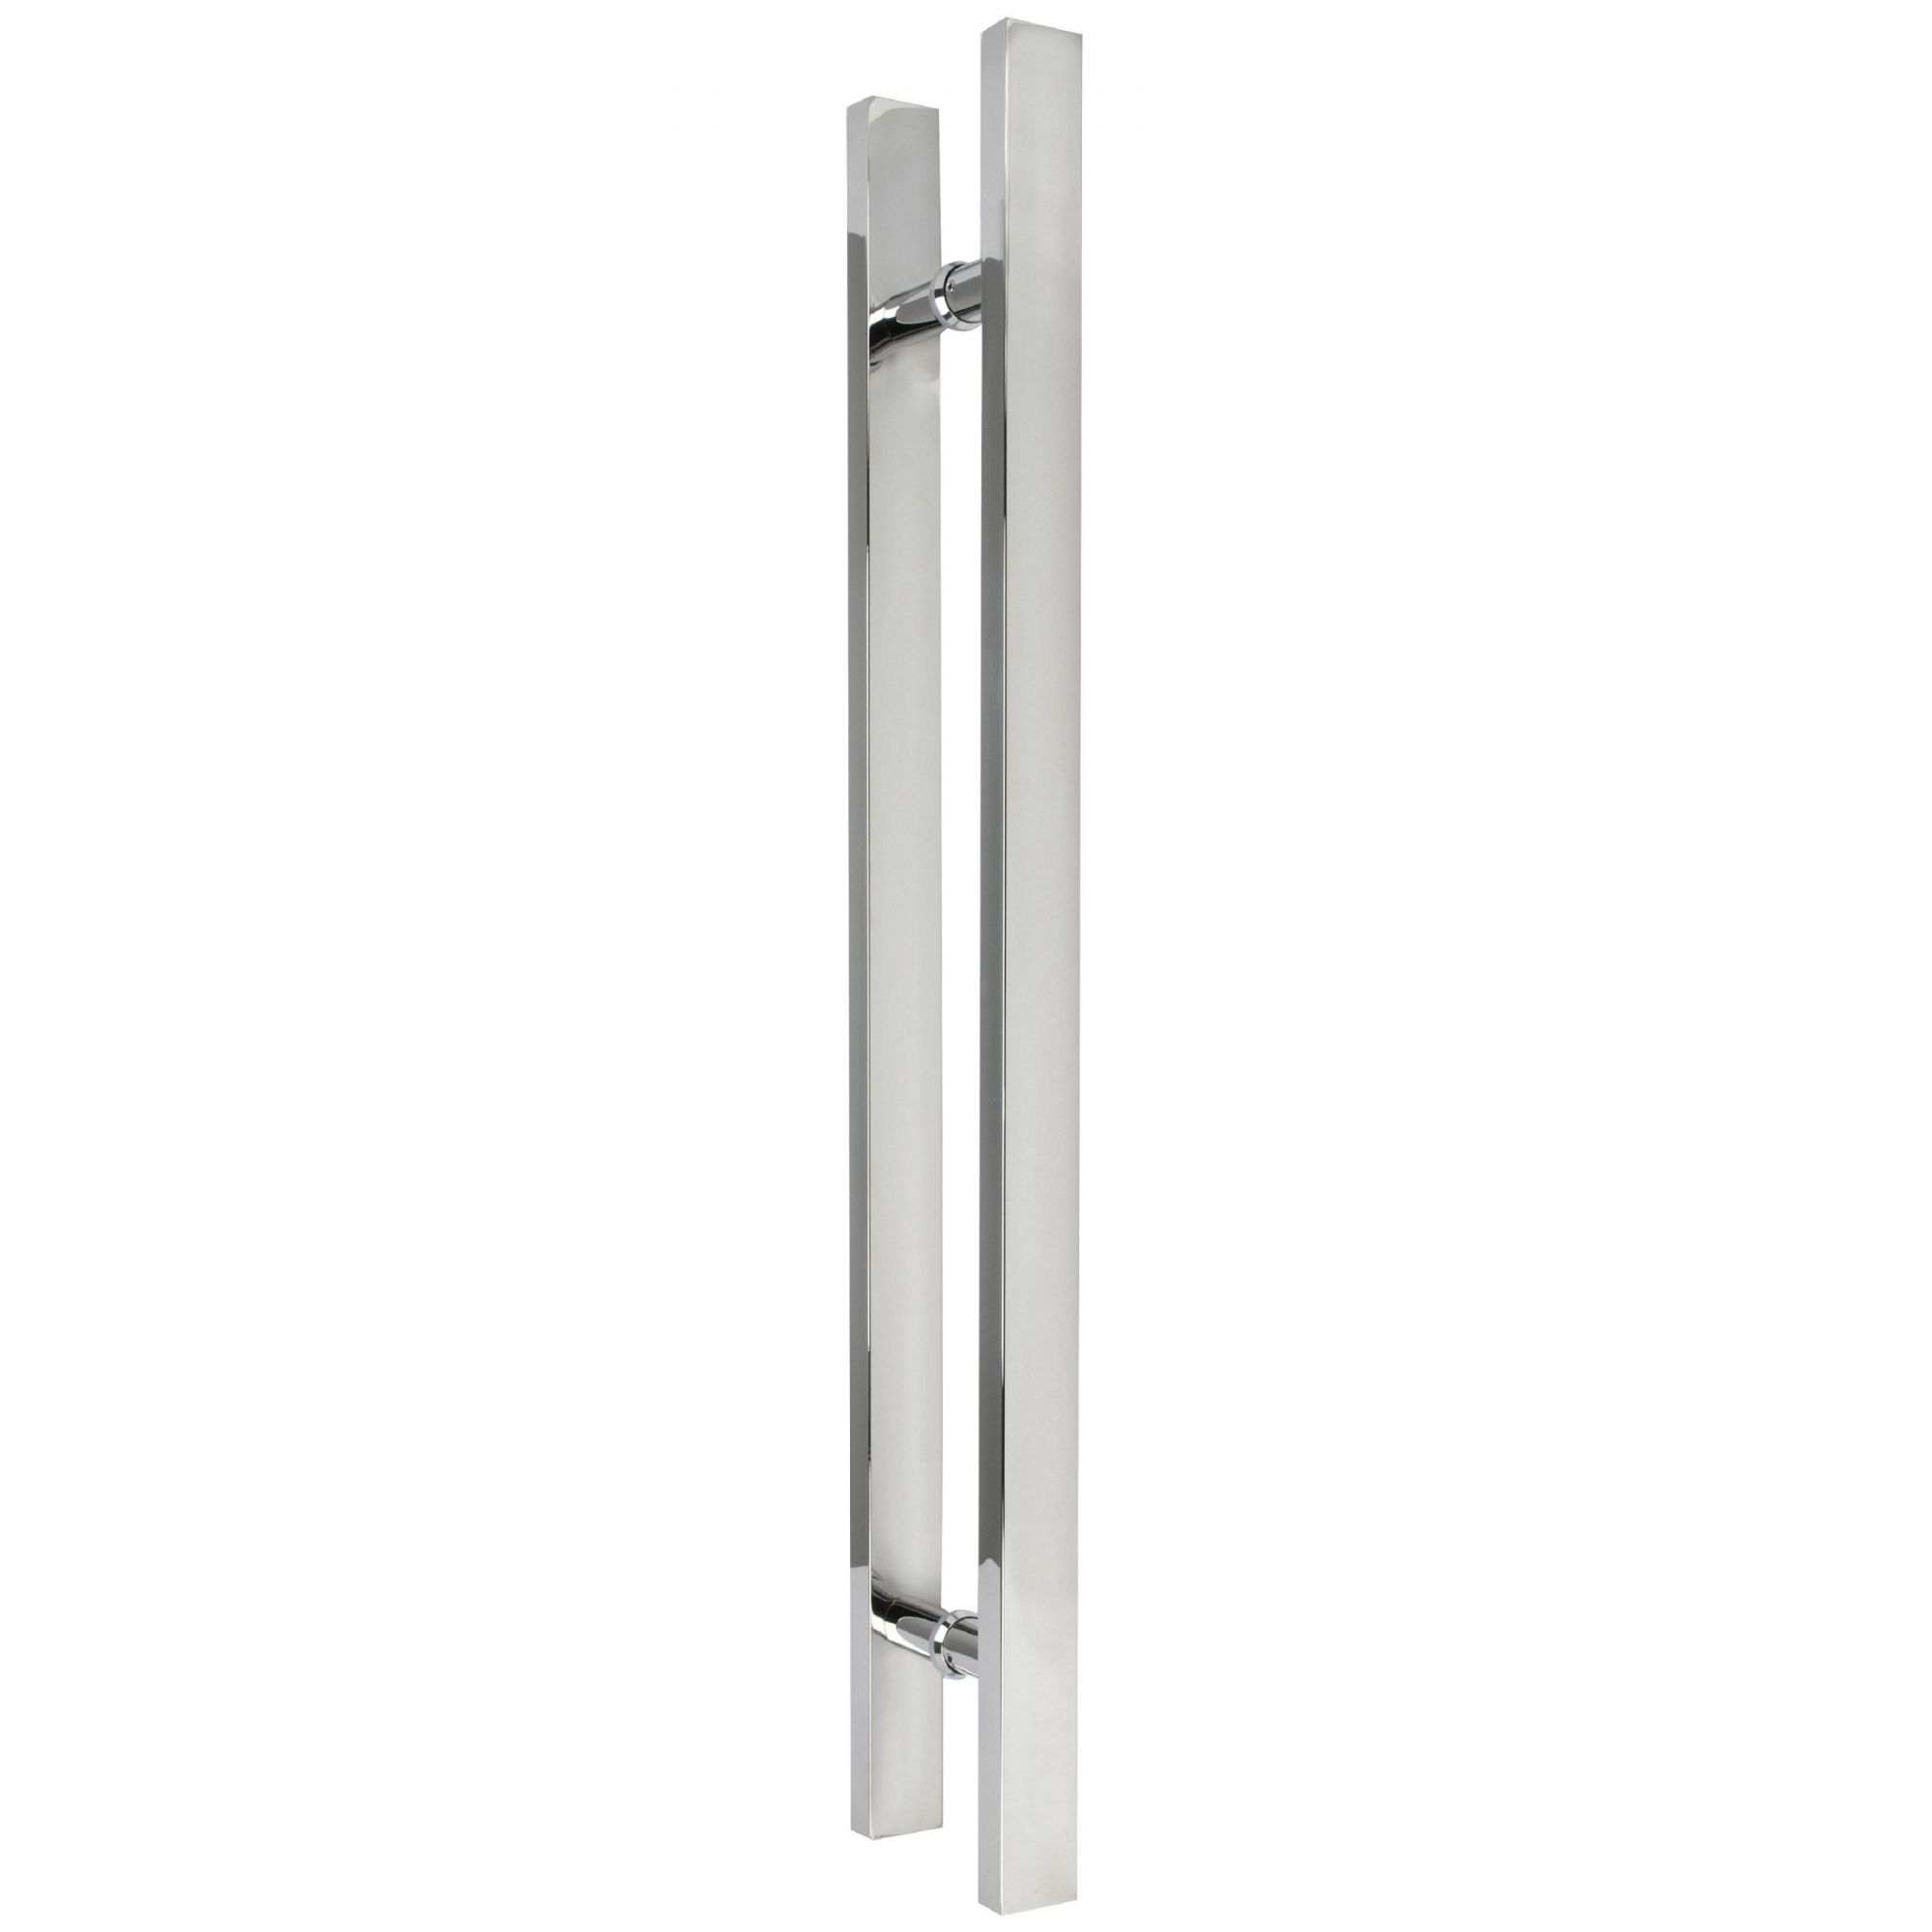 Puxador inox para porta madeira e vidro reto barra chata 40x60cm H06